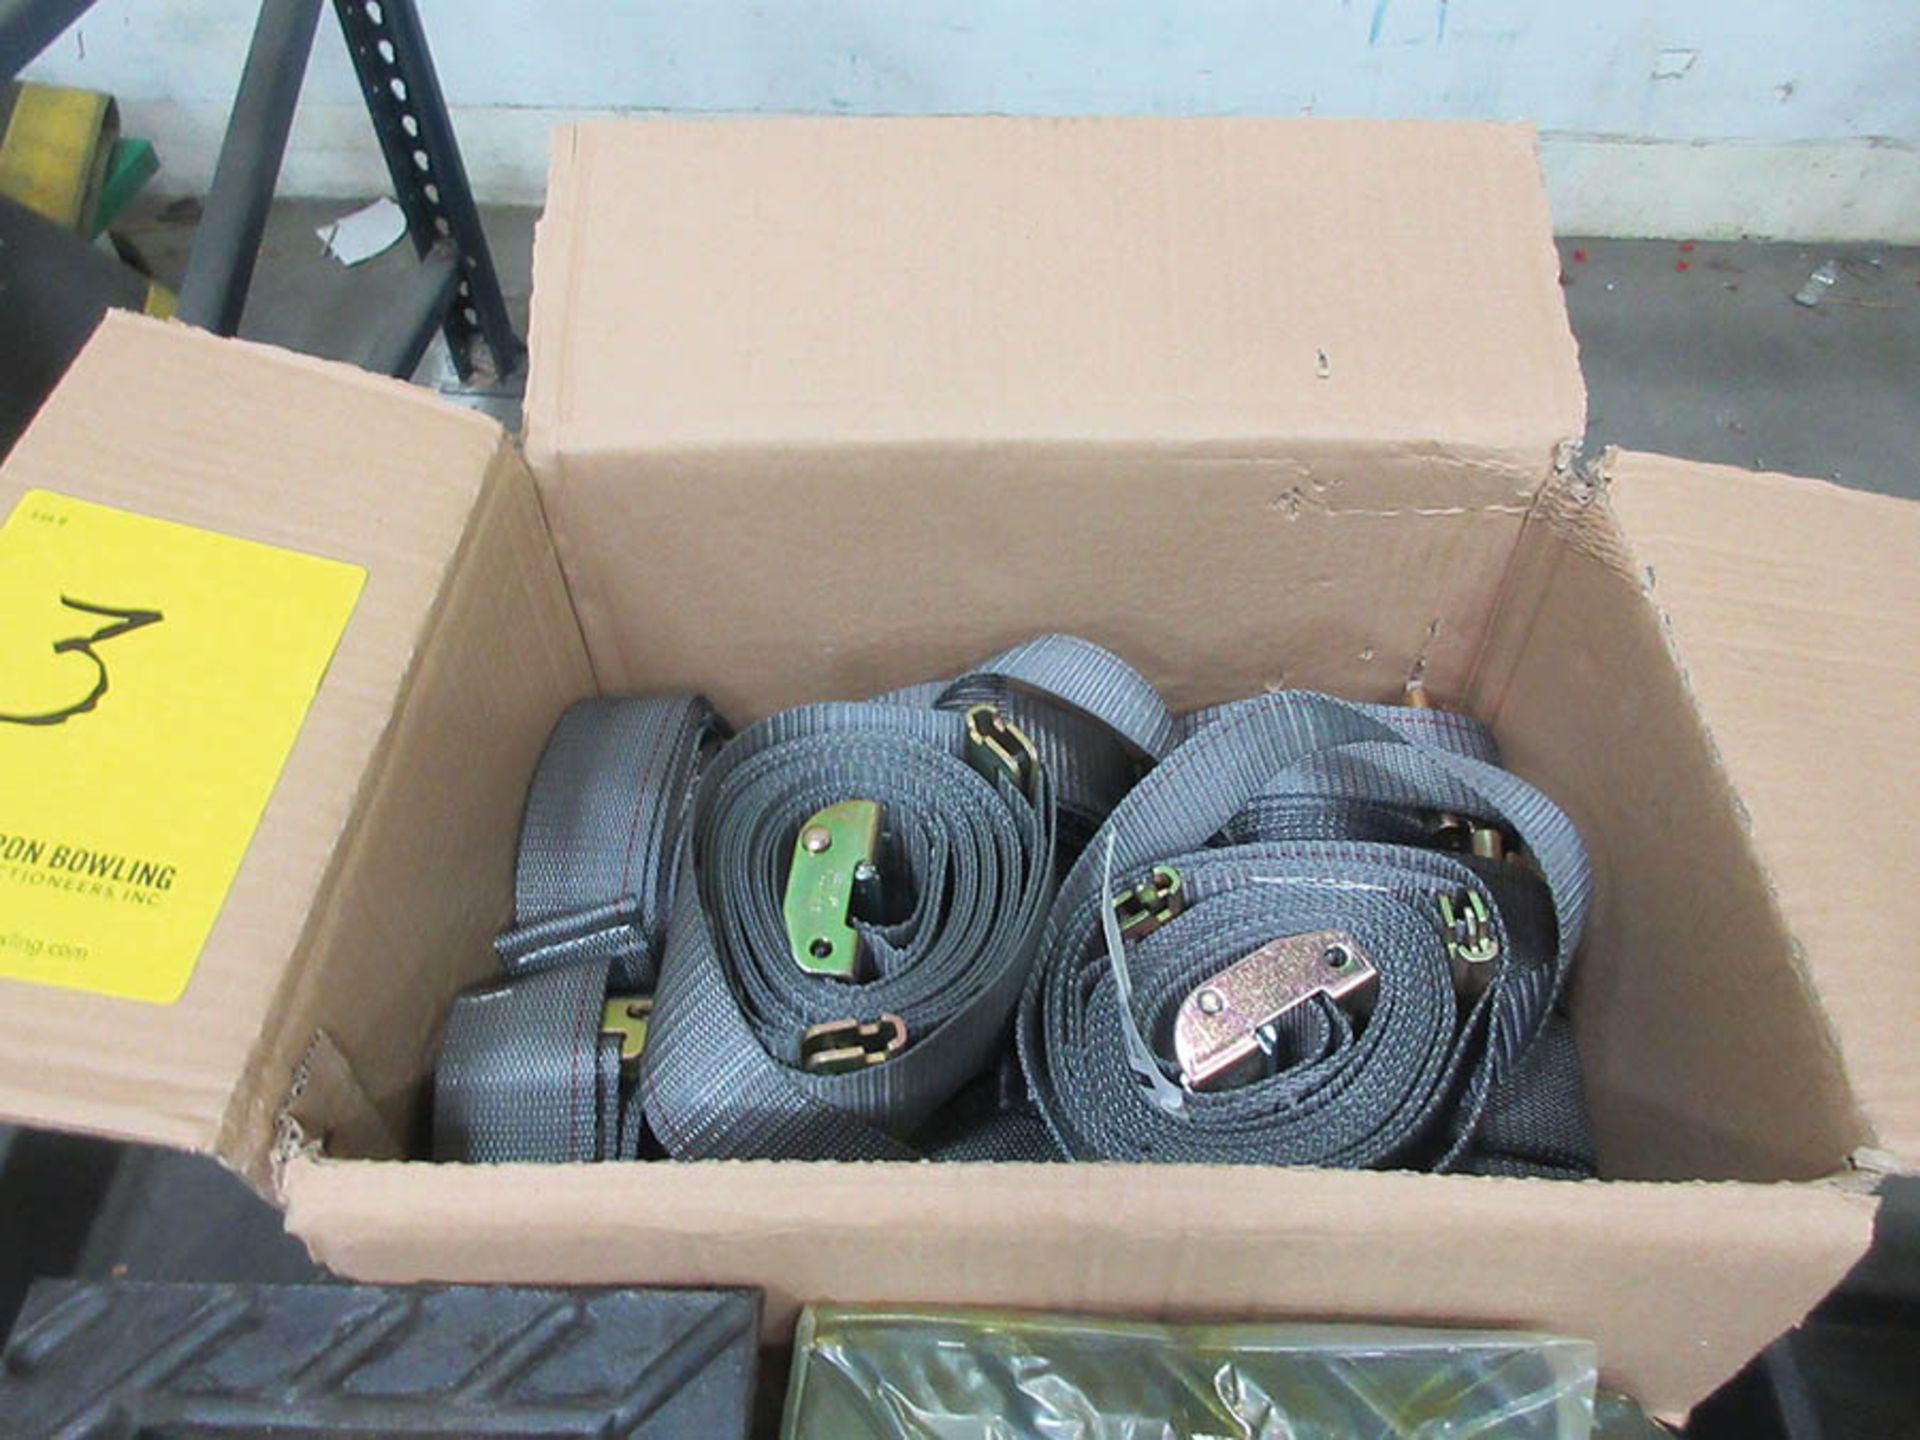 Lot 3 - (2) BOXES U.S. CARGO RATCHET STRAPS, (1) BOX LODI METALS CAMBUCKLE STRAPS